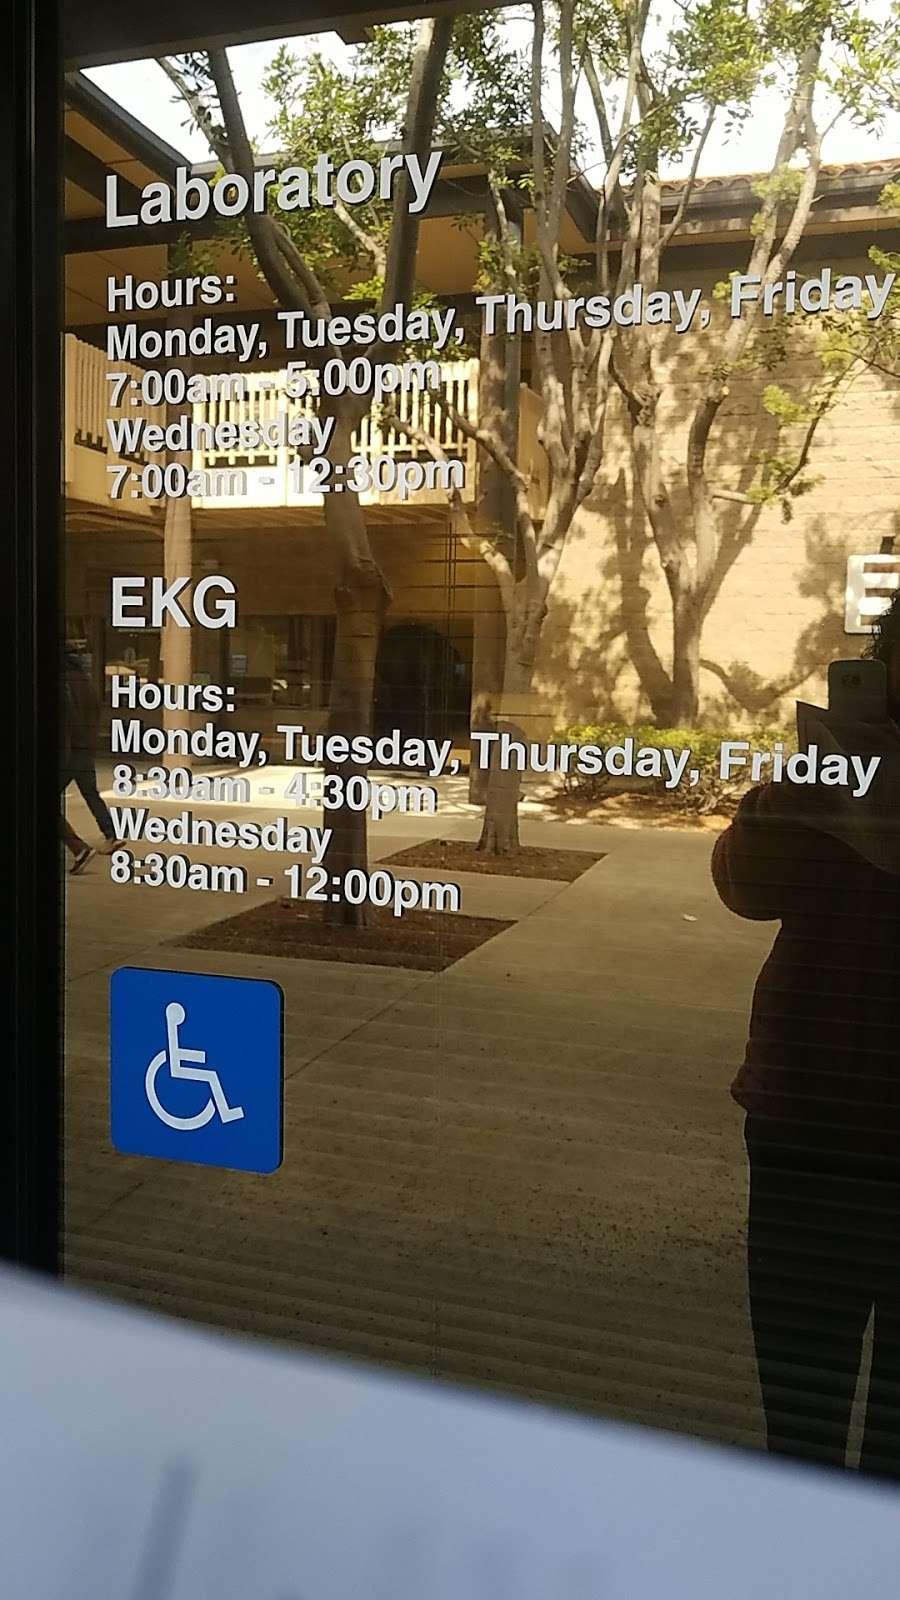 Kaiser Permanente Medical Offices - hospital  | Photo 7 of 10 | Address: 3955 Bonita Rd, Bonita, CA 91902, USA | Phone: (833) 574-2273